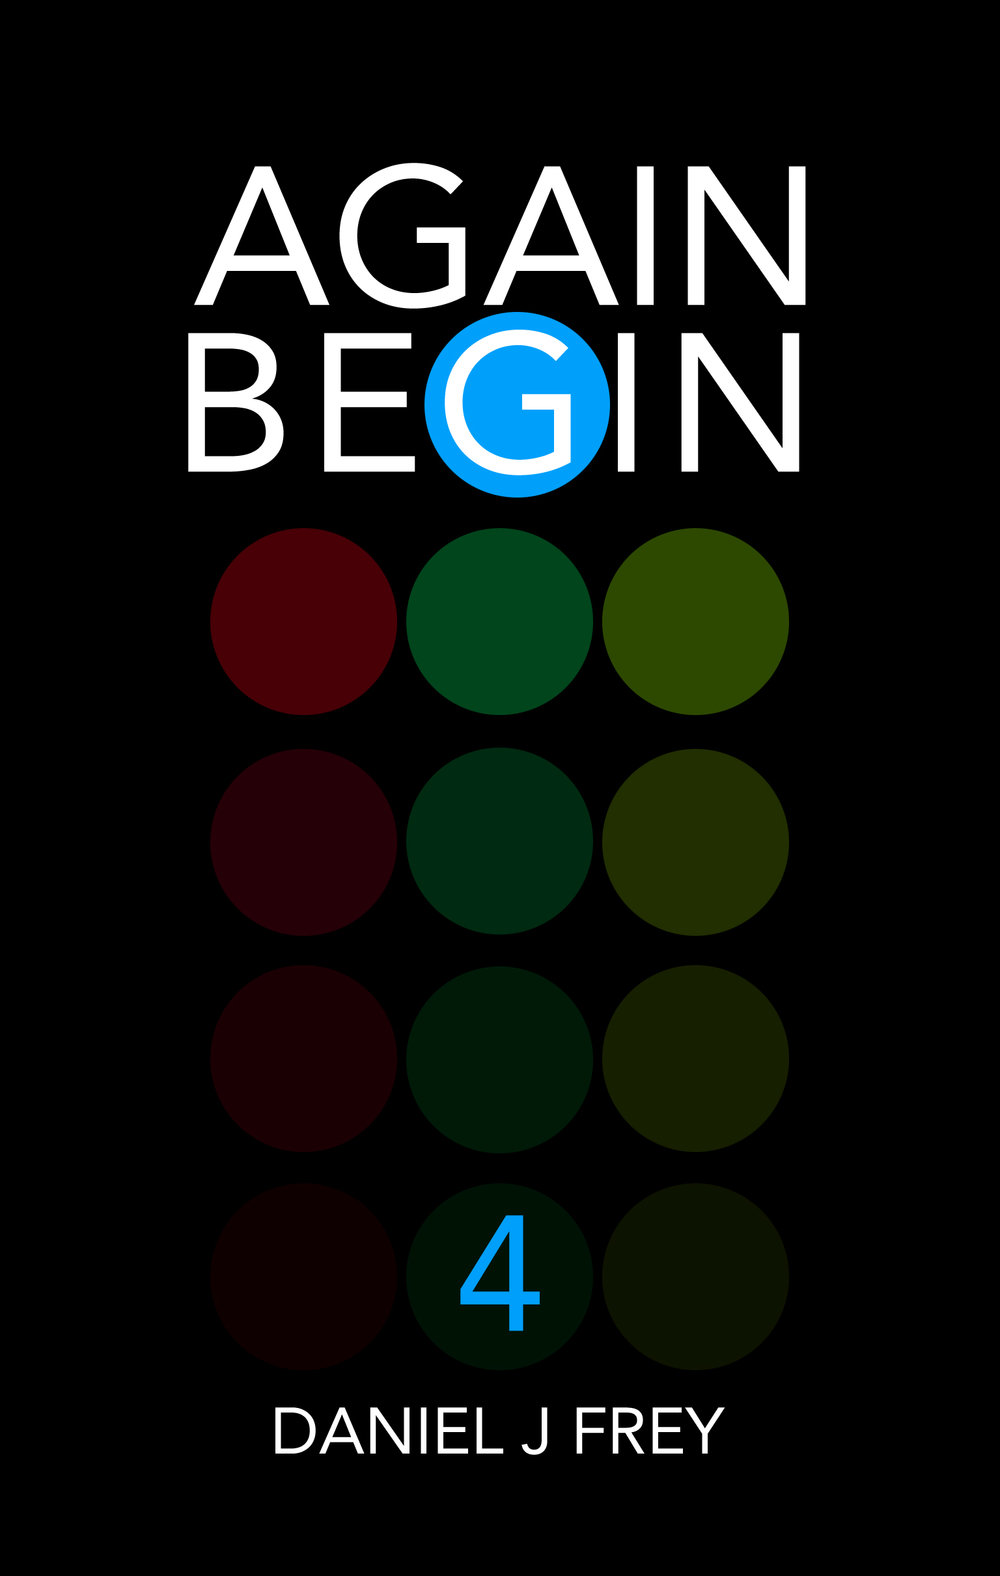 Again Begin 4 - The Test